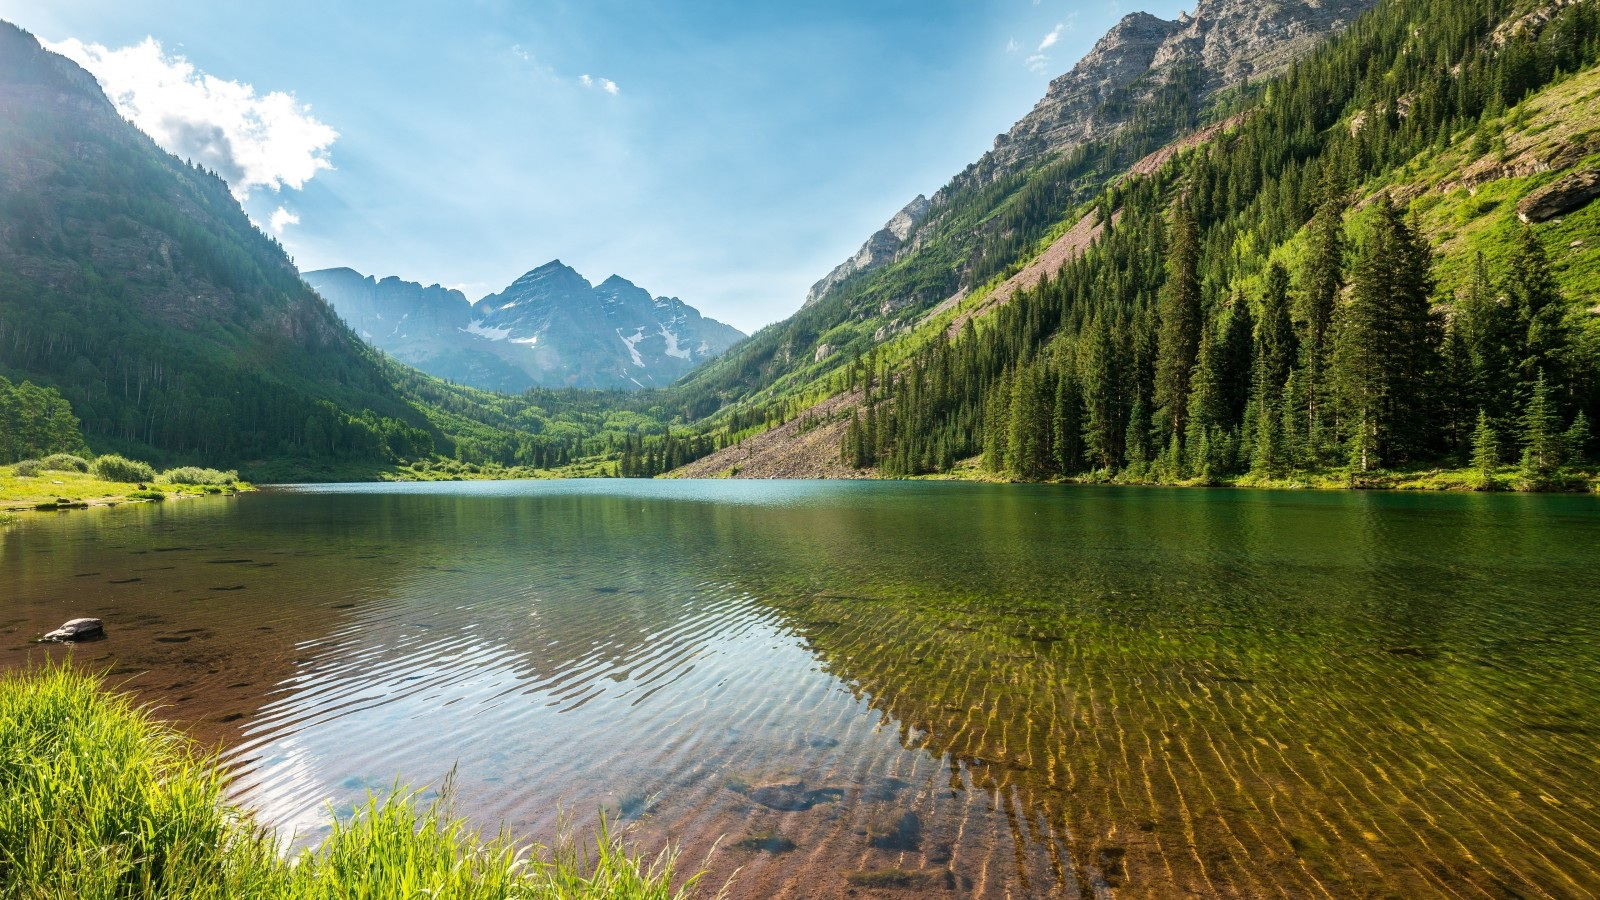 5120x2880_px_Colorado_landscape_Maroon_Bells-1063073.jpg